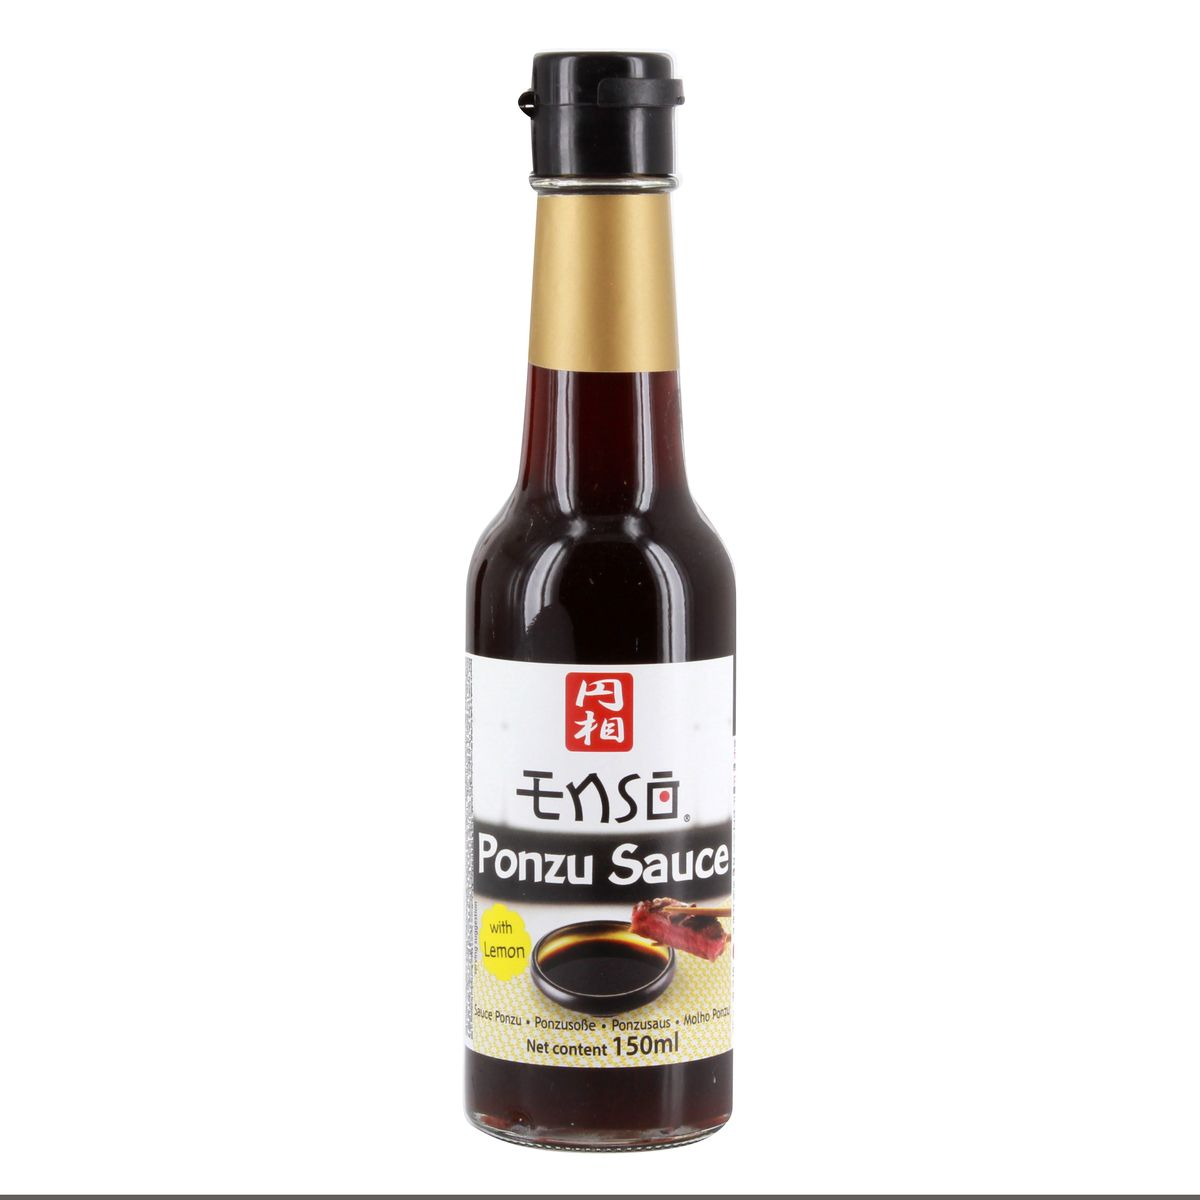 Ponzu sauce 150ml - Enso